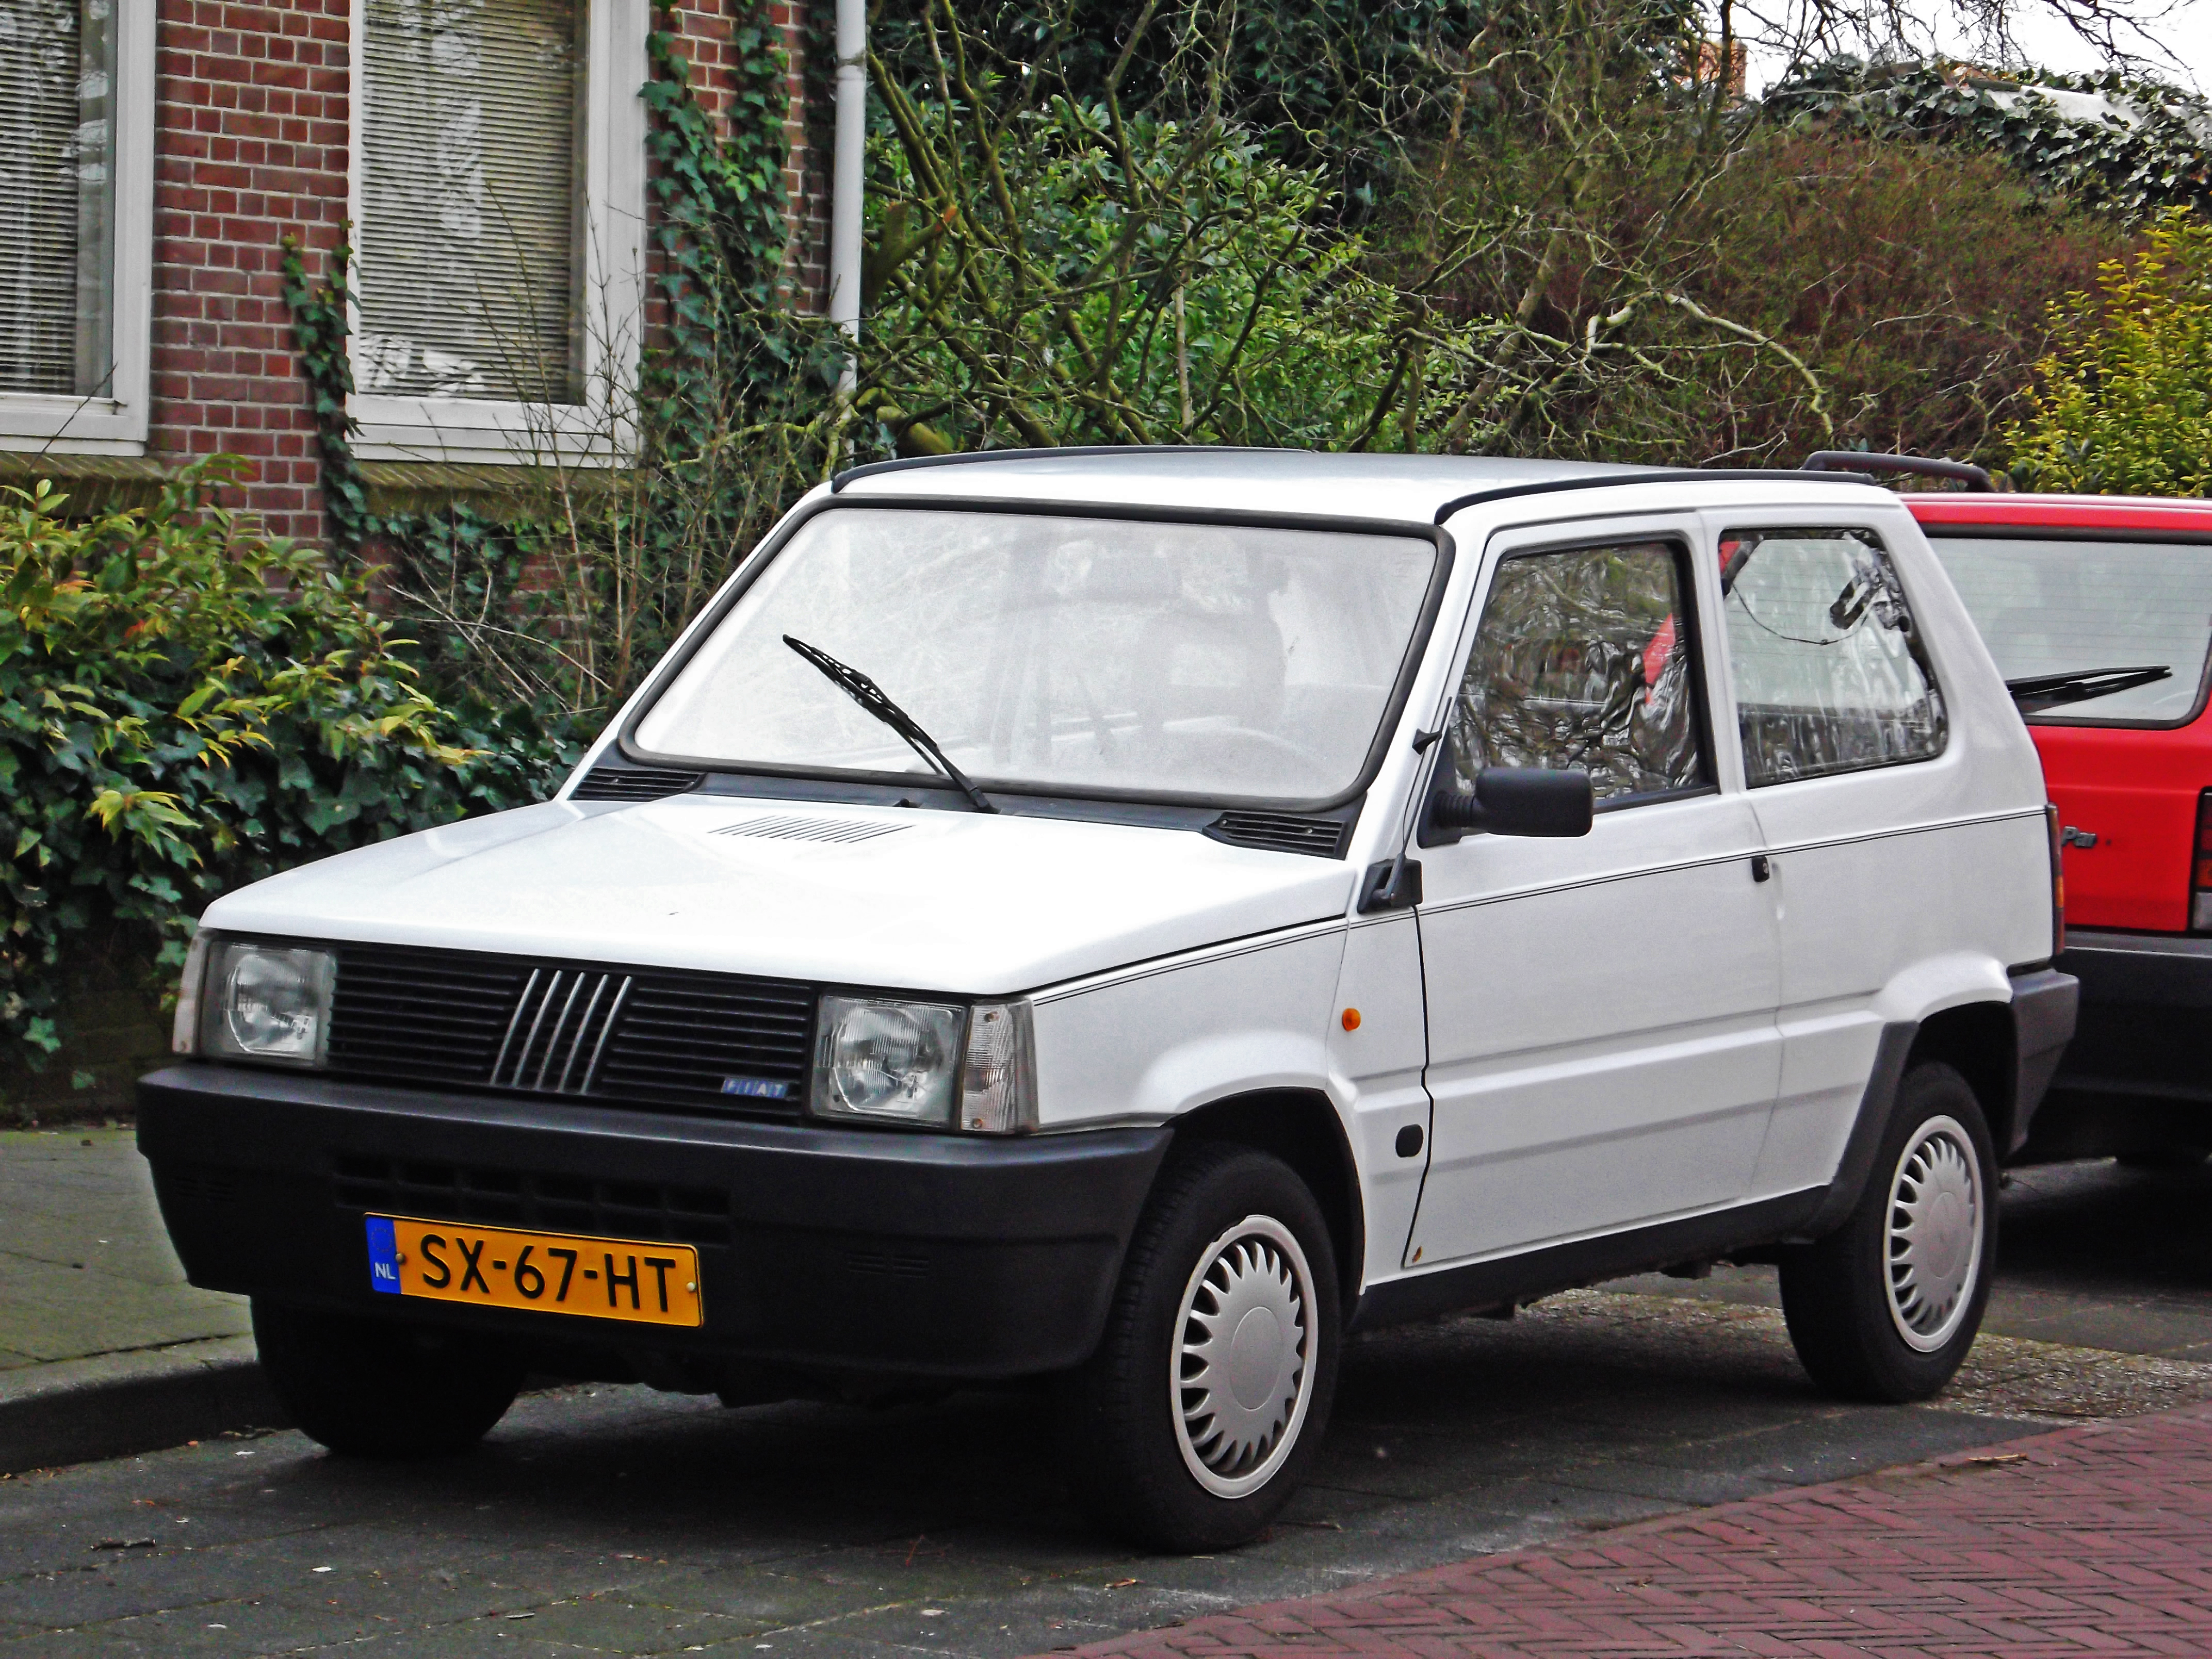 Fiat Panda (1980) - Wikipedia on fiat stilo, fiat coupe, fiat seicento, fiat linea, fiat multipla, fiat 500l, fiat bravo, fiat marea, fiat 500 turbo, fiat cars, fiat 500 abarth, fiat doblo, fiat spider, fiat x1/9, fiat cinquecento, fiat panda, fiat ritmo, fiat barchetta,